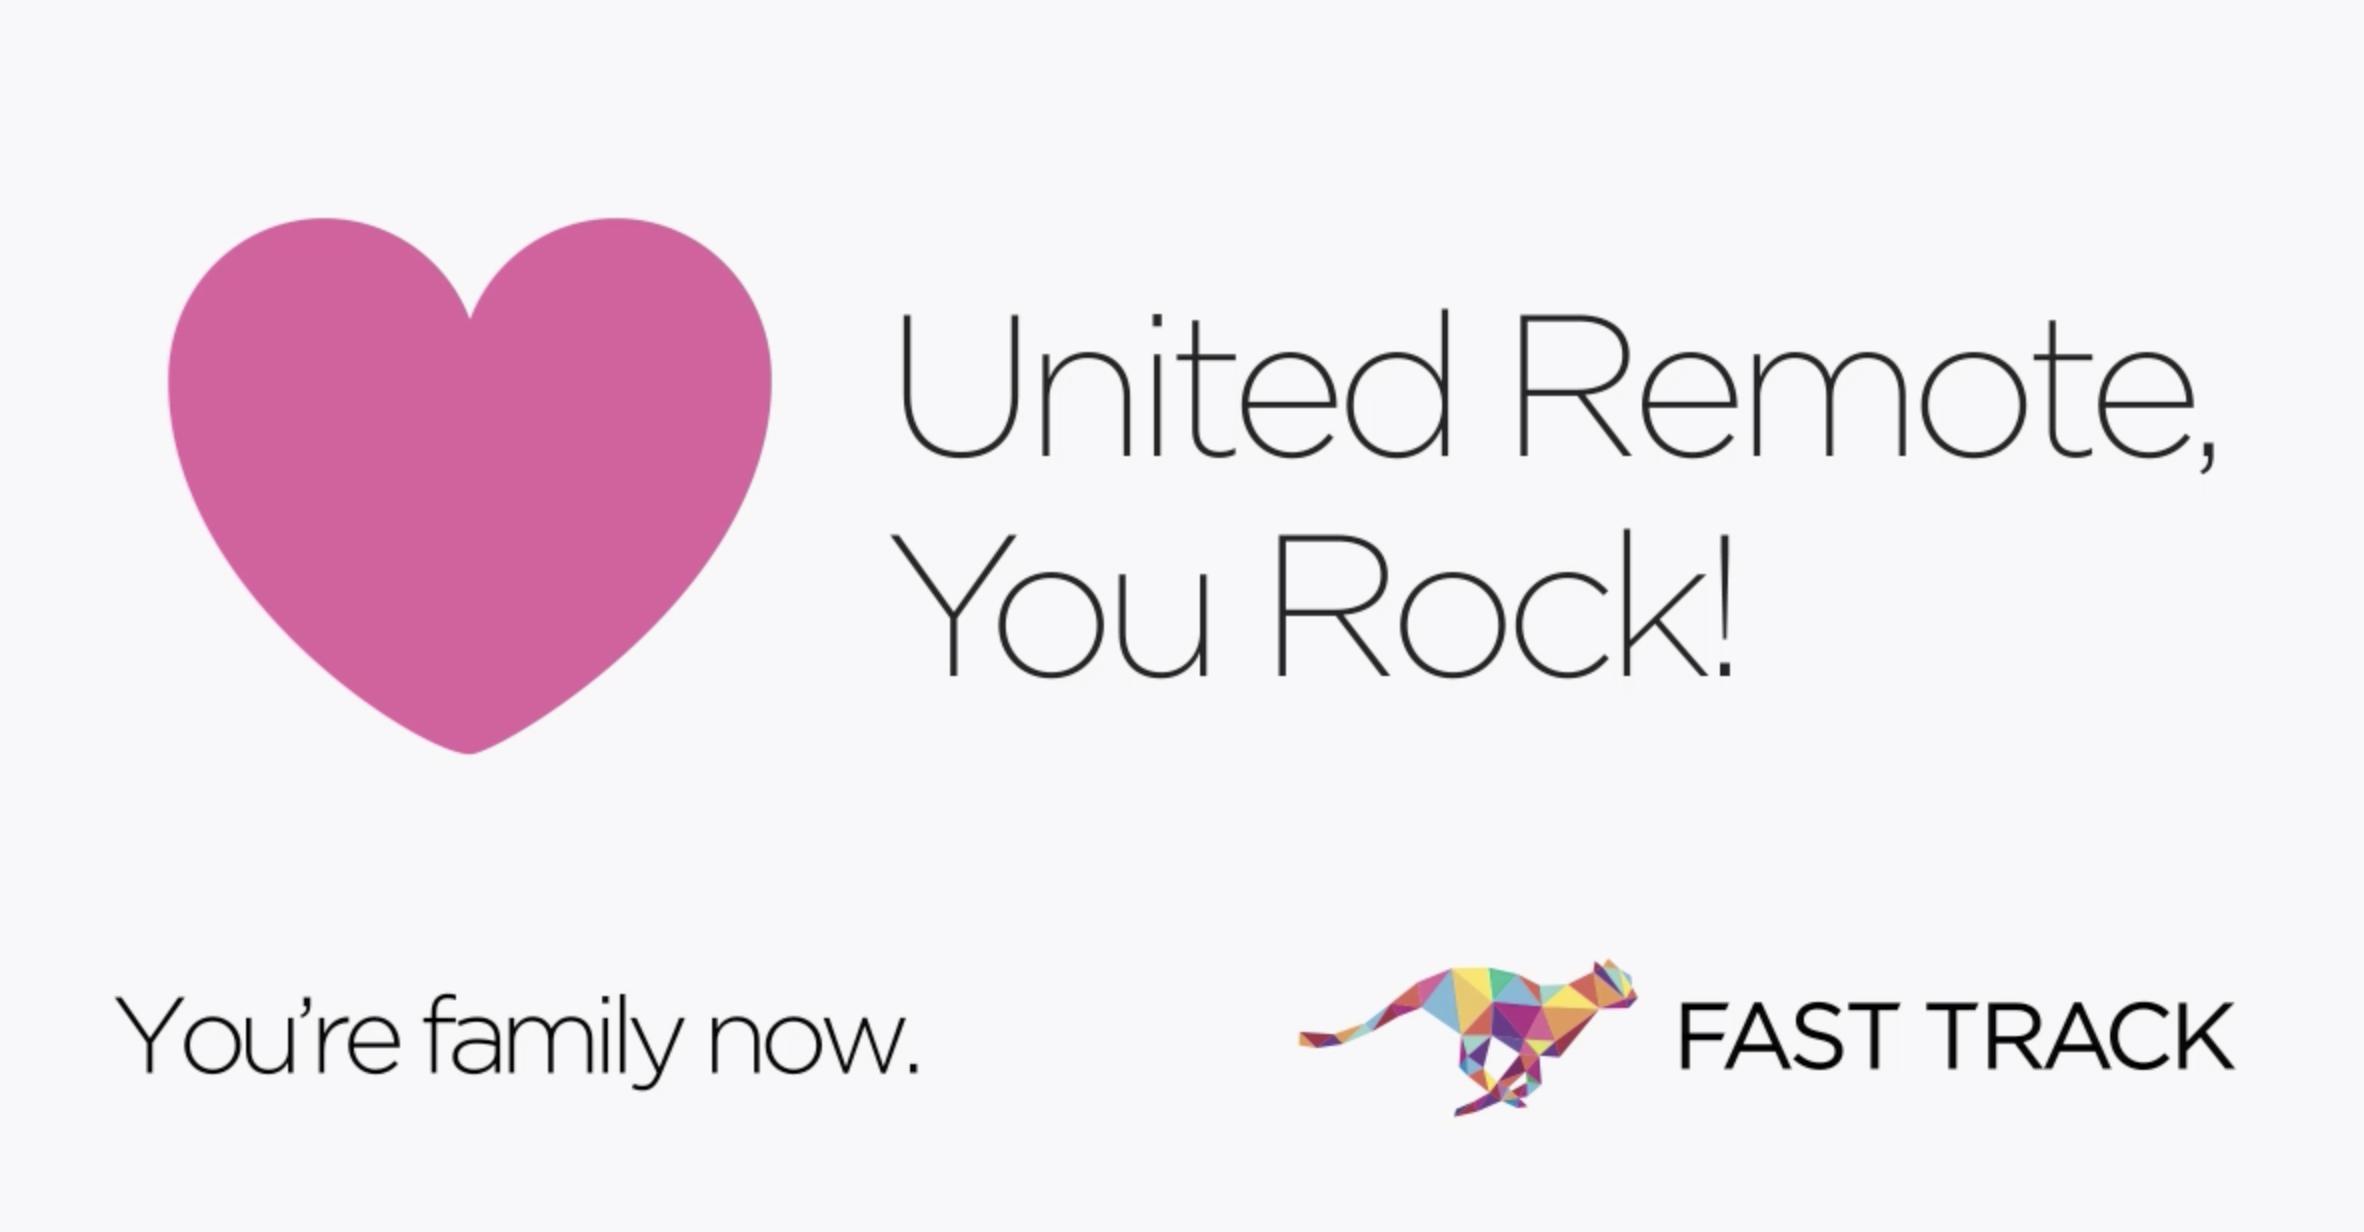 FAST TRACK Unite Remote Partnership